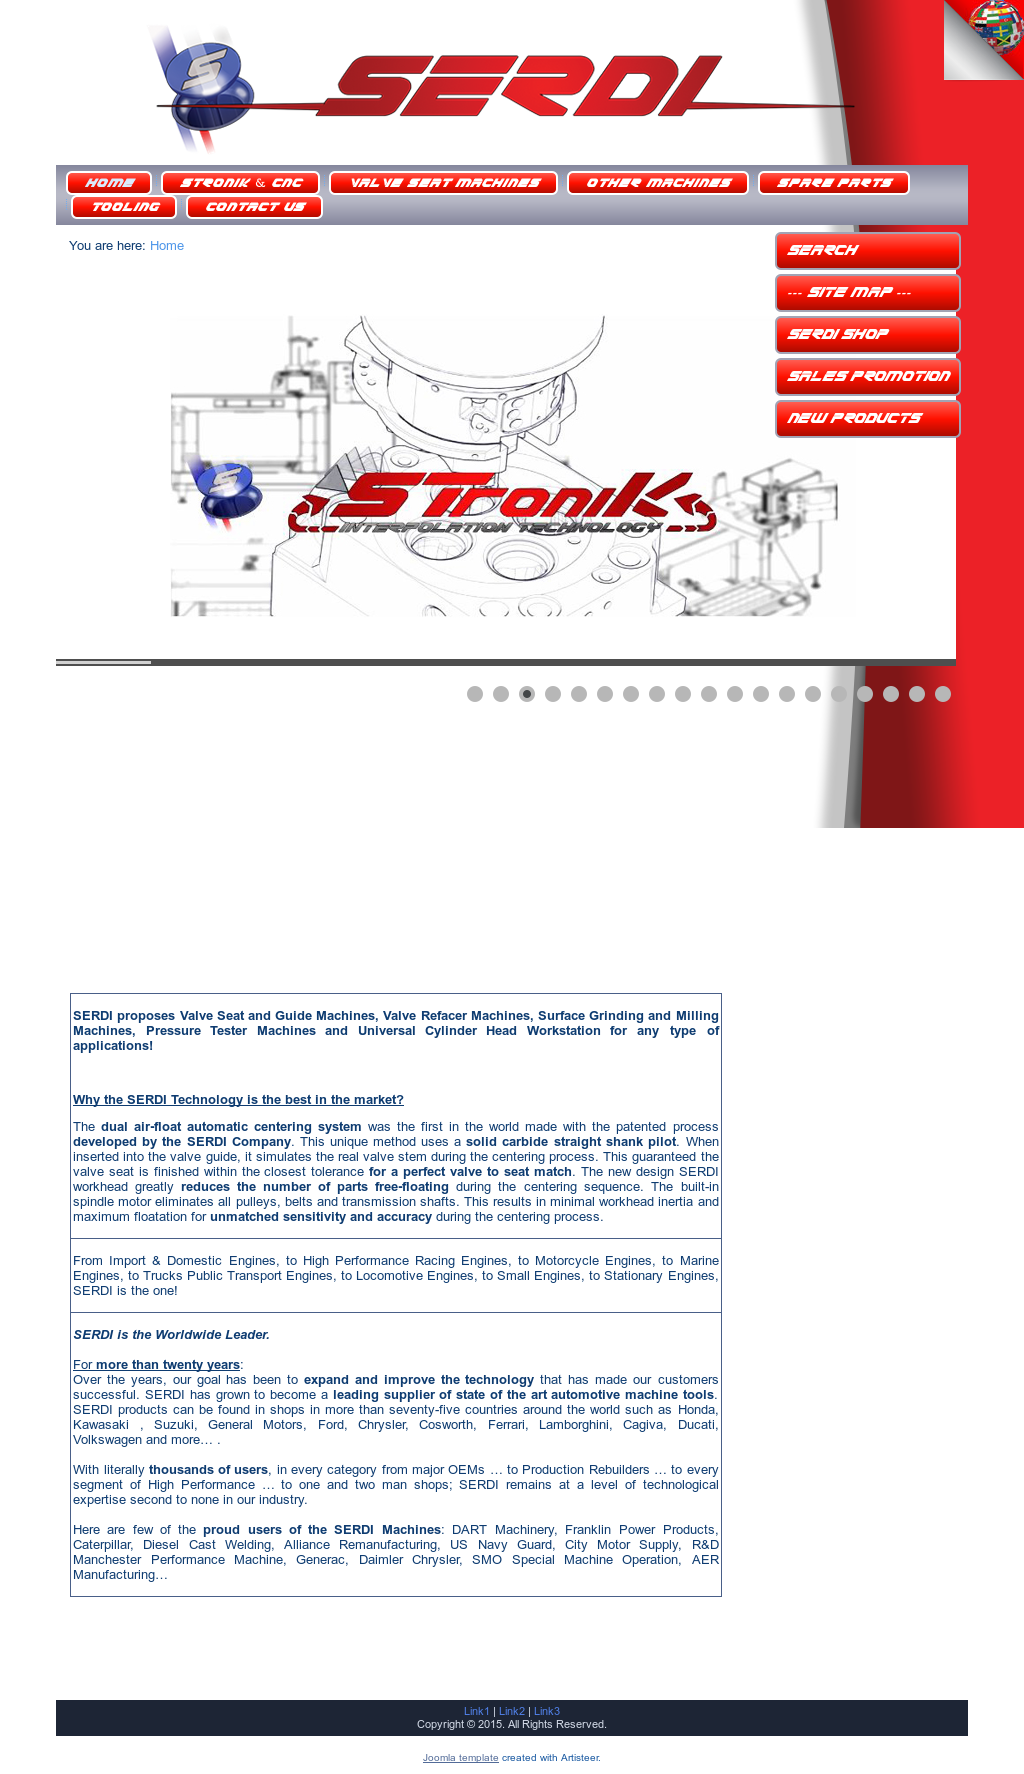 Serdi Competitors, Revenue and Employees - Owler Company Profile